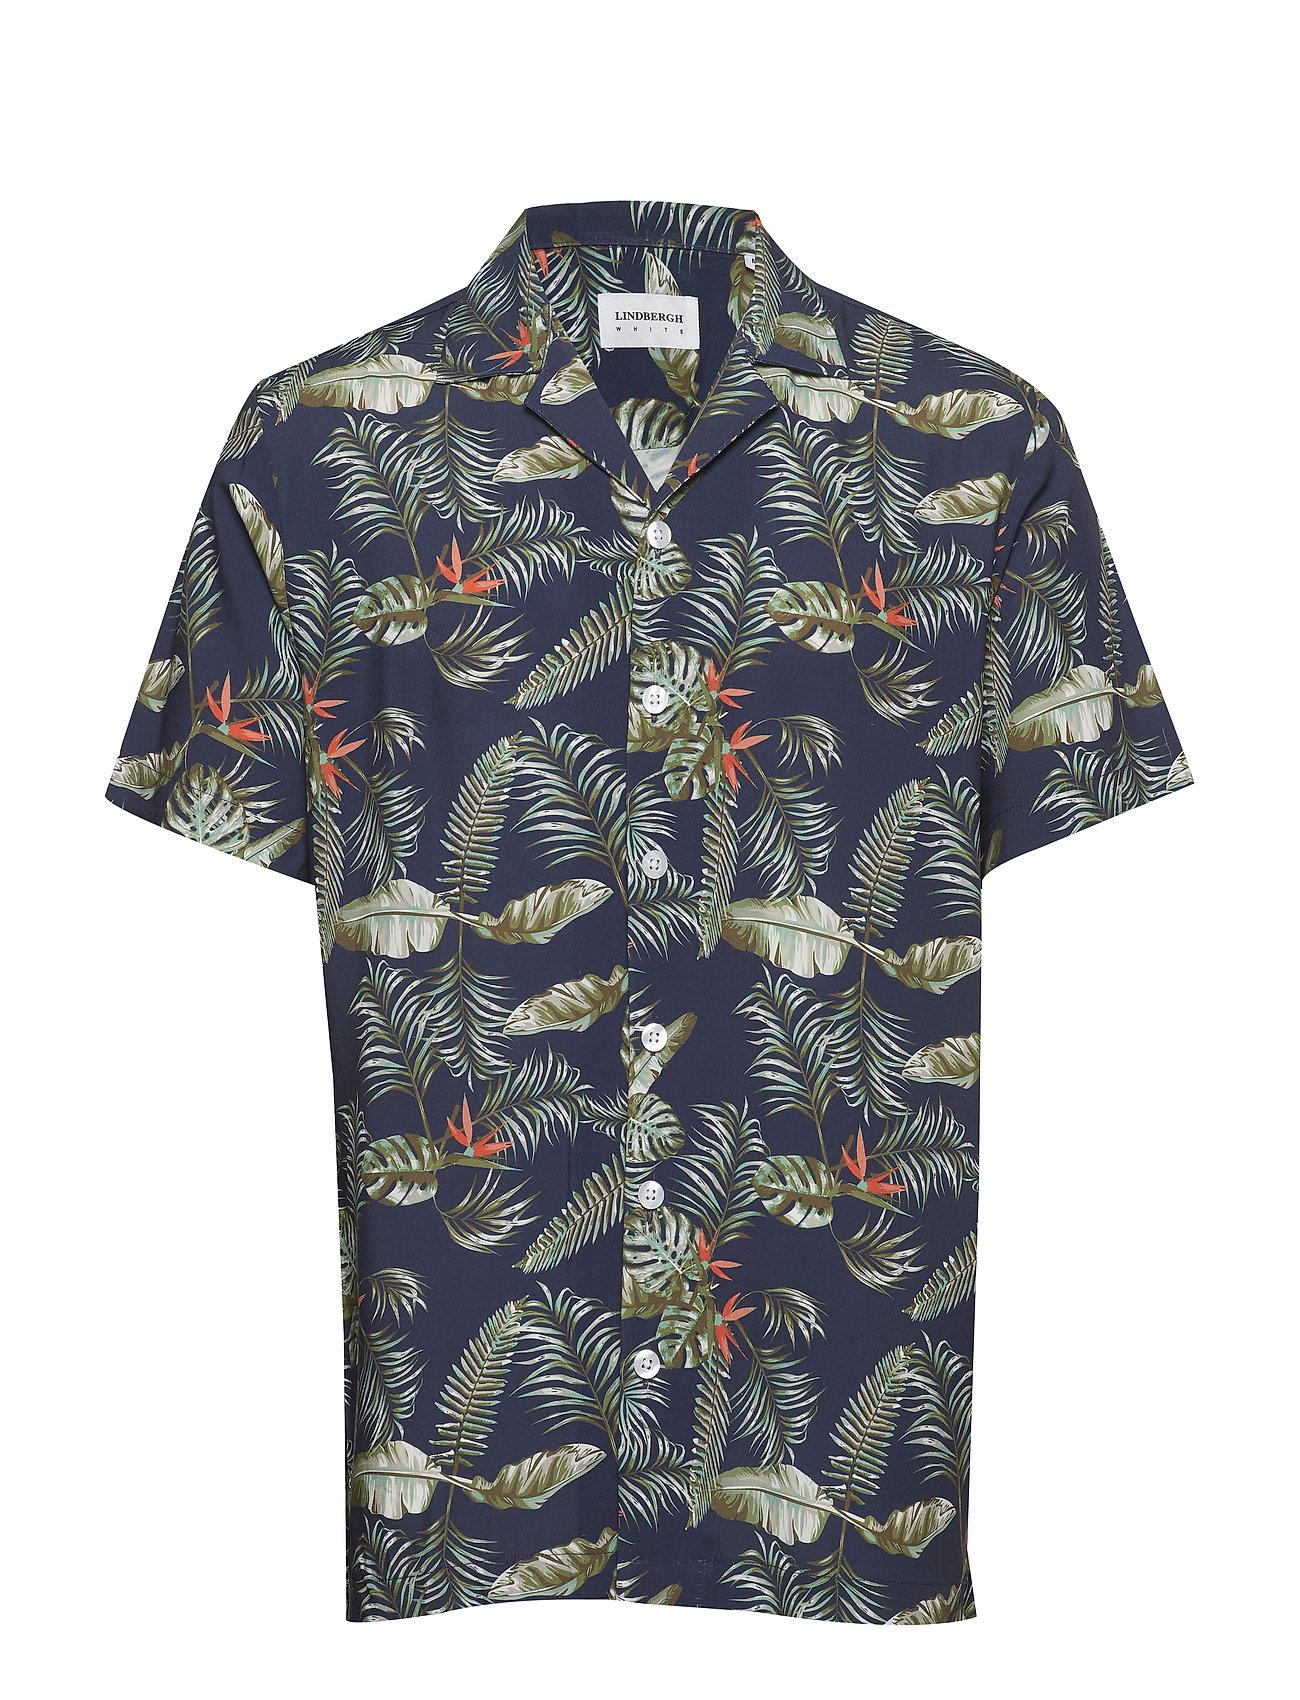 Lindbergh Resort printed shirt S/S - DARK BLUE